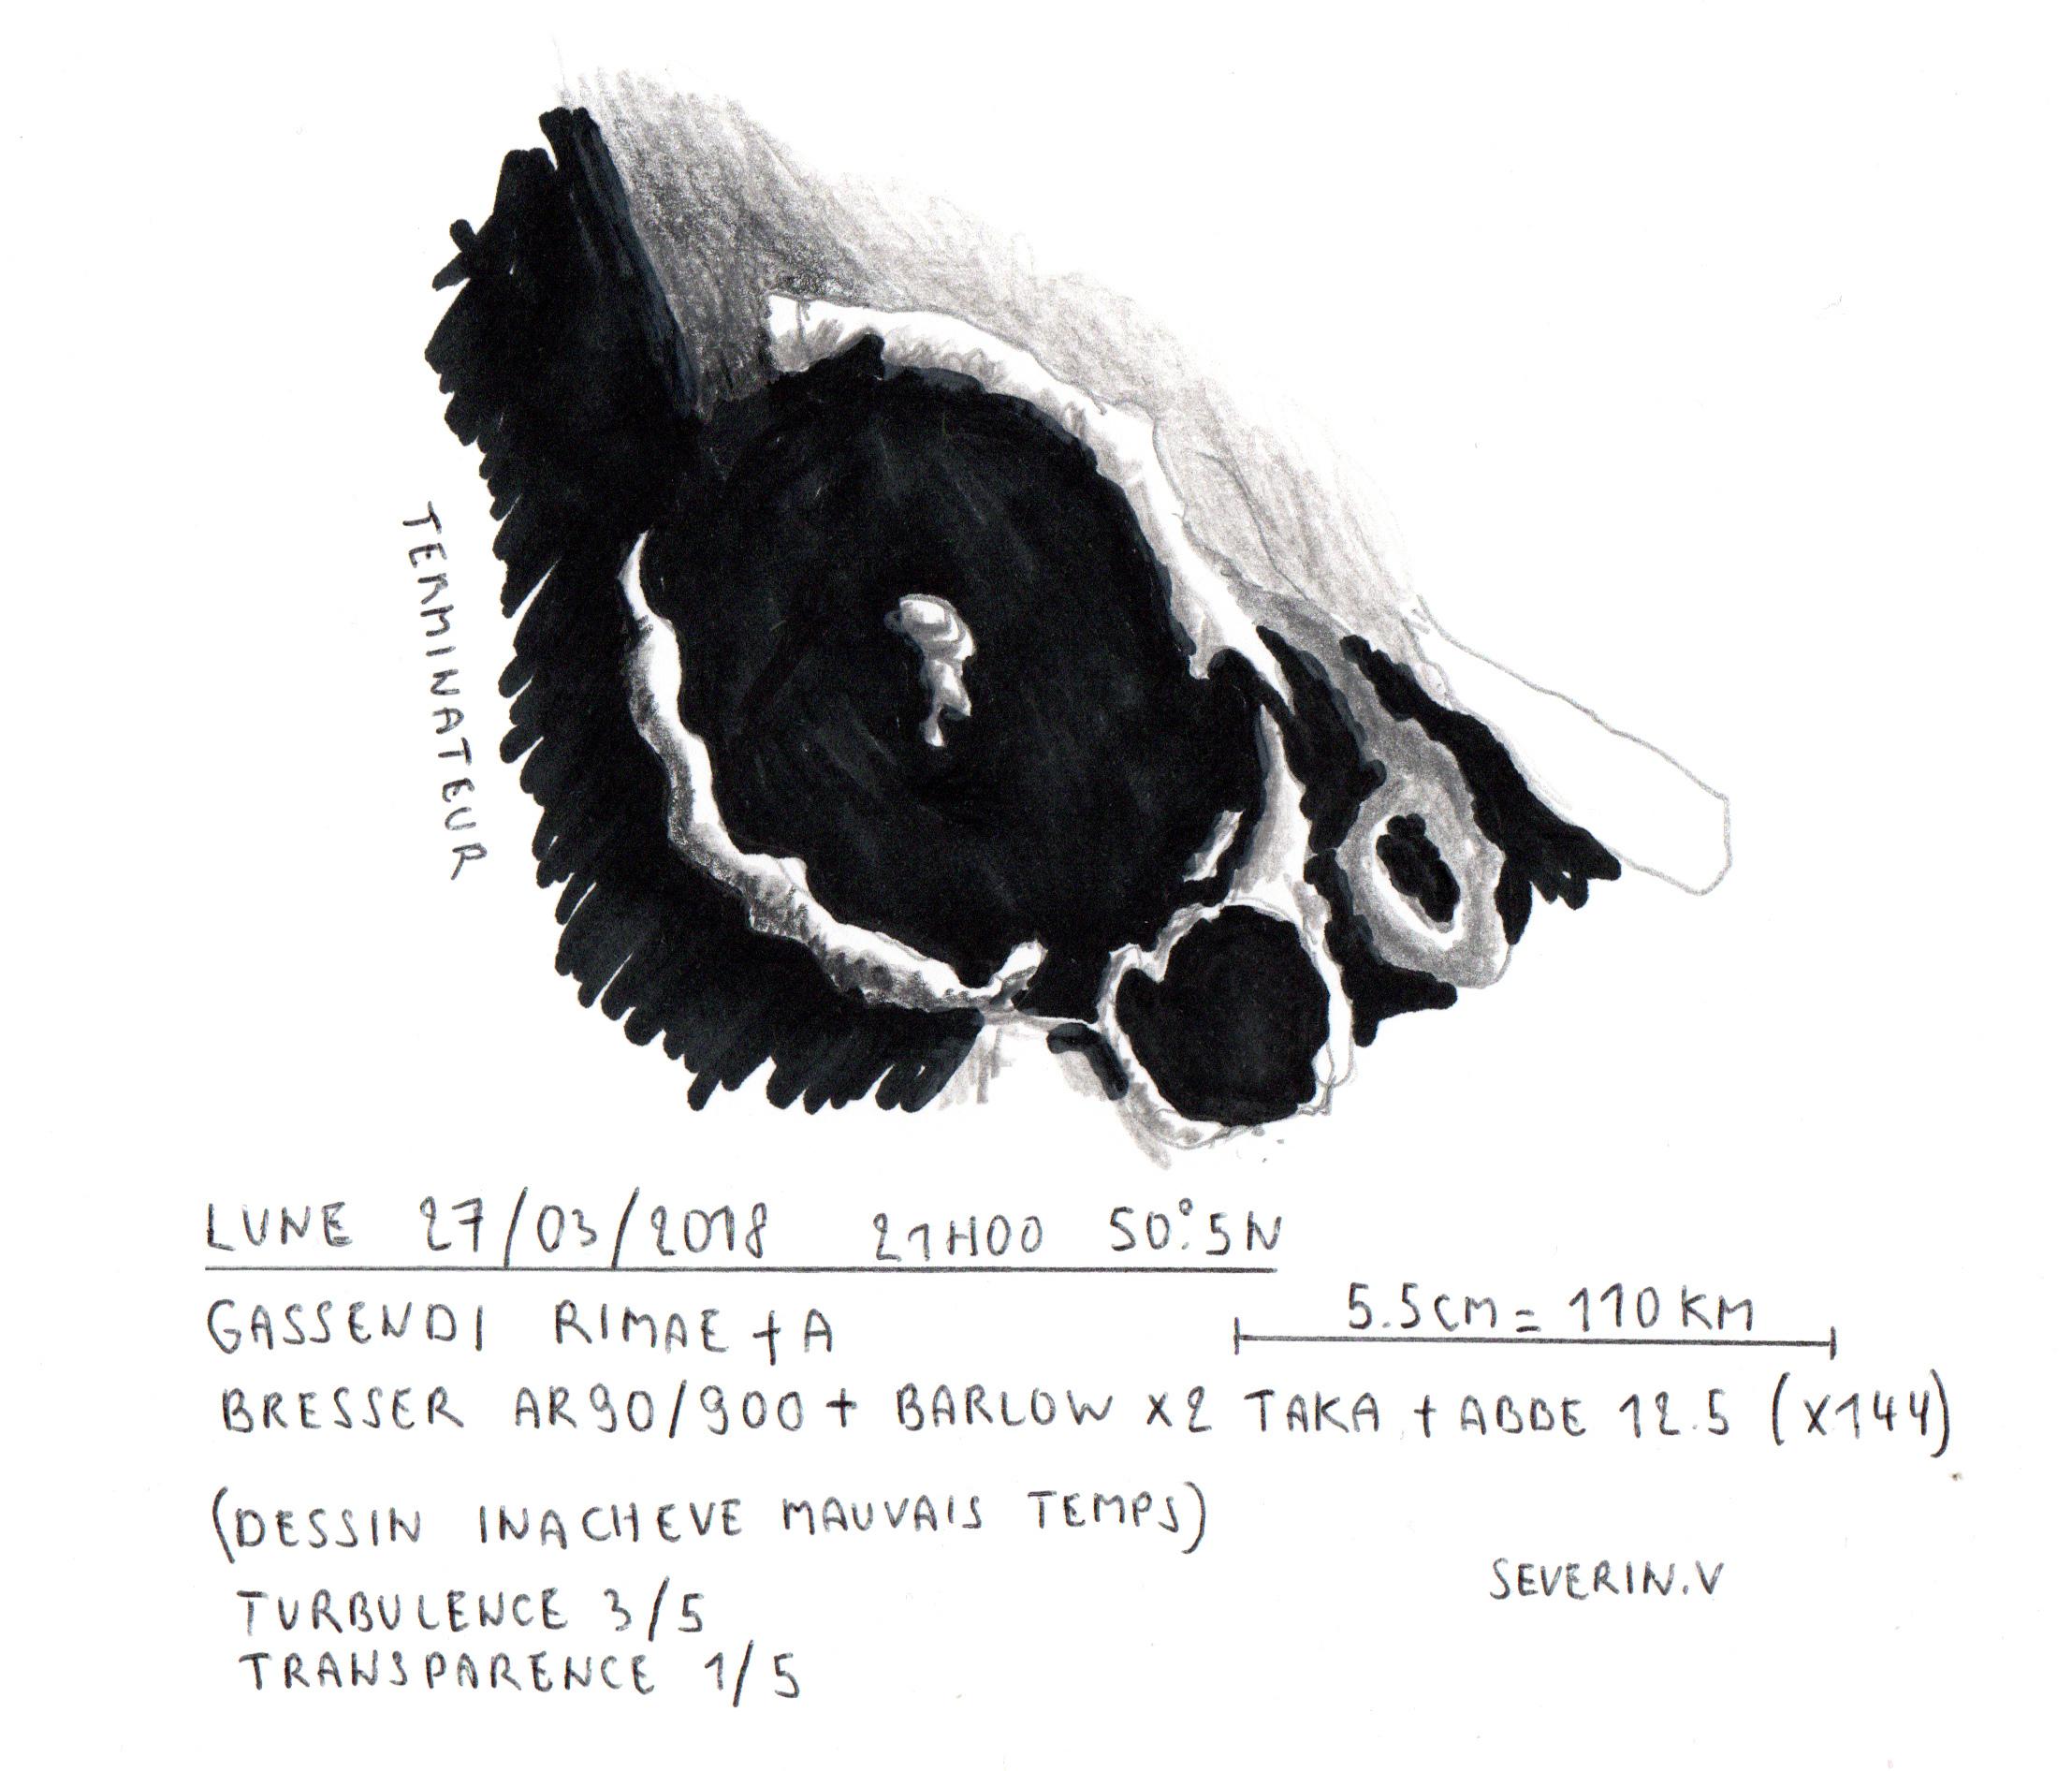 DESSINS RIMAE+A (27-03-18)